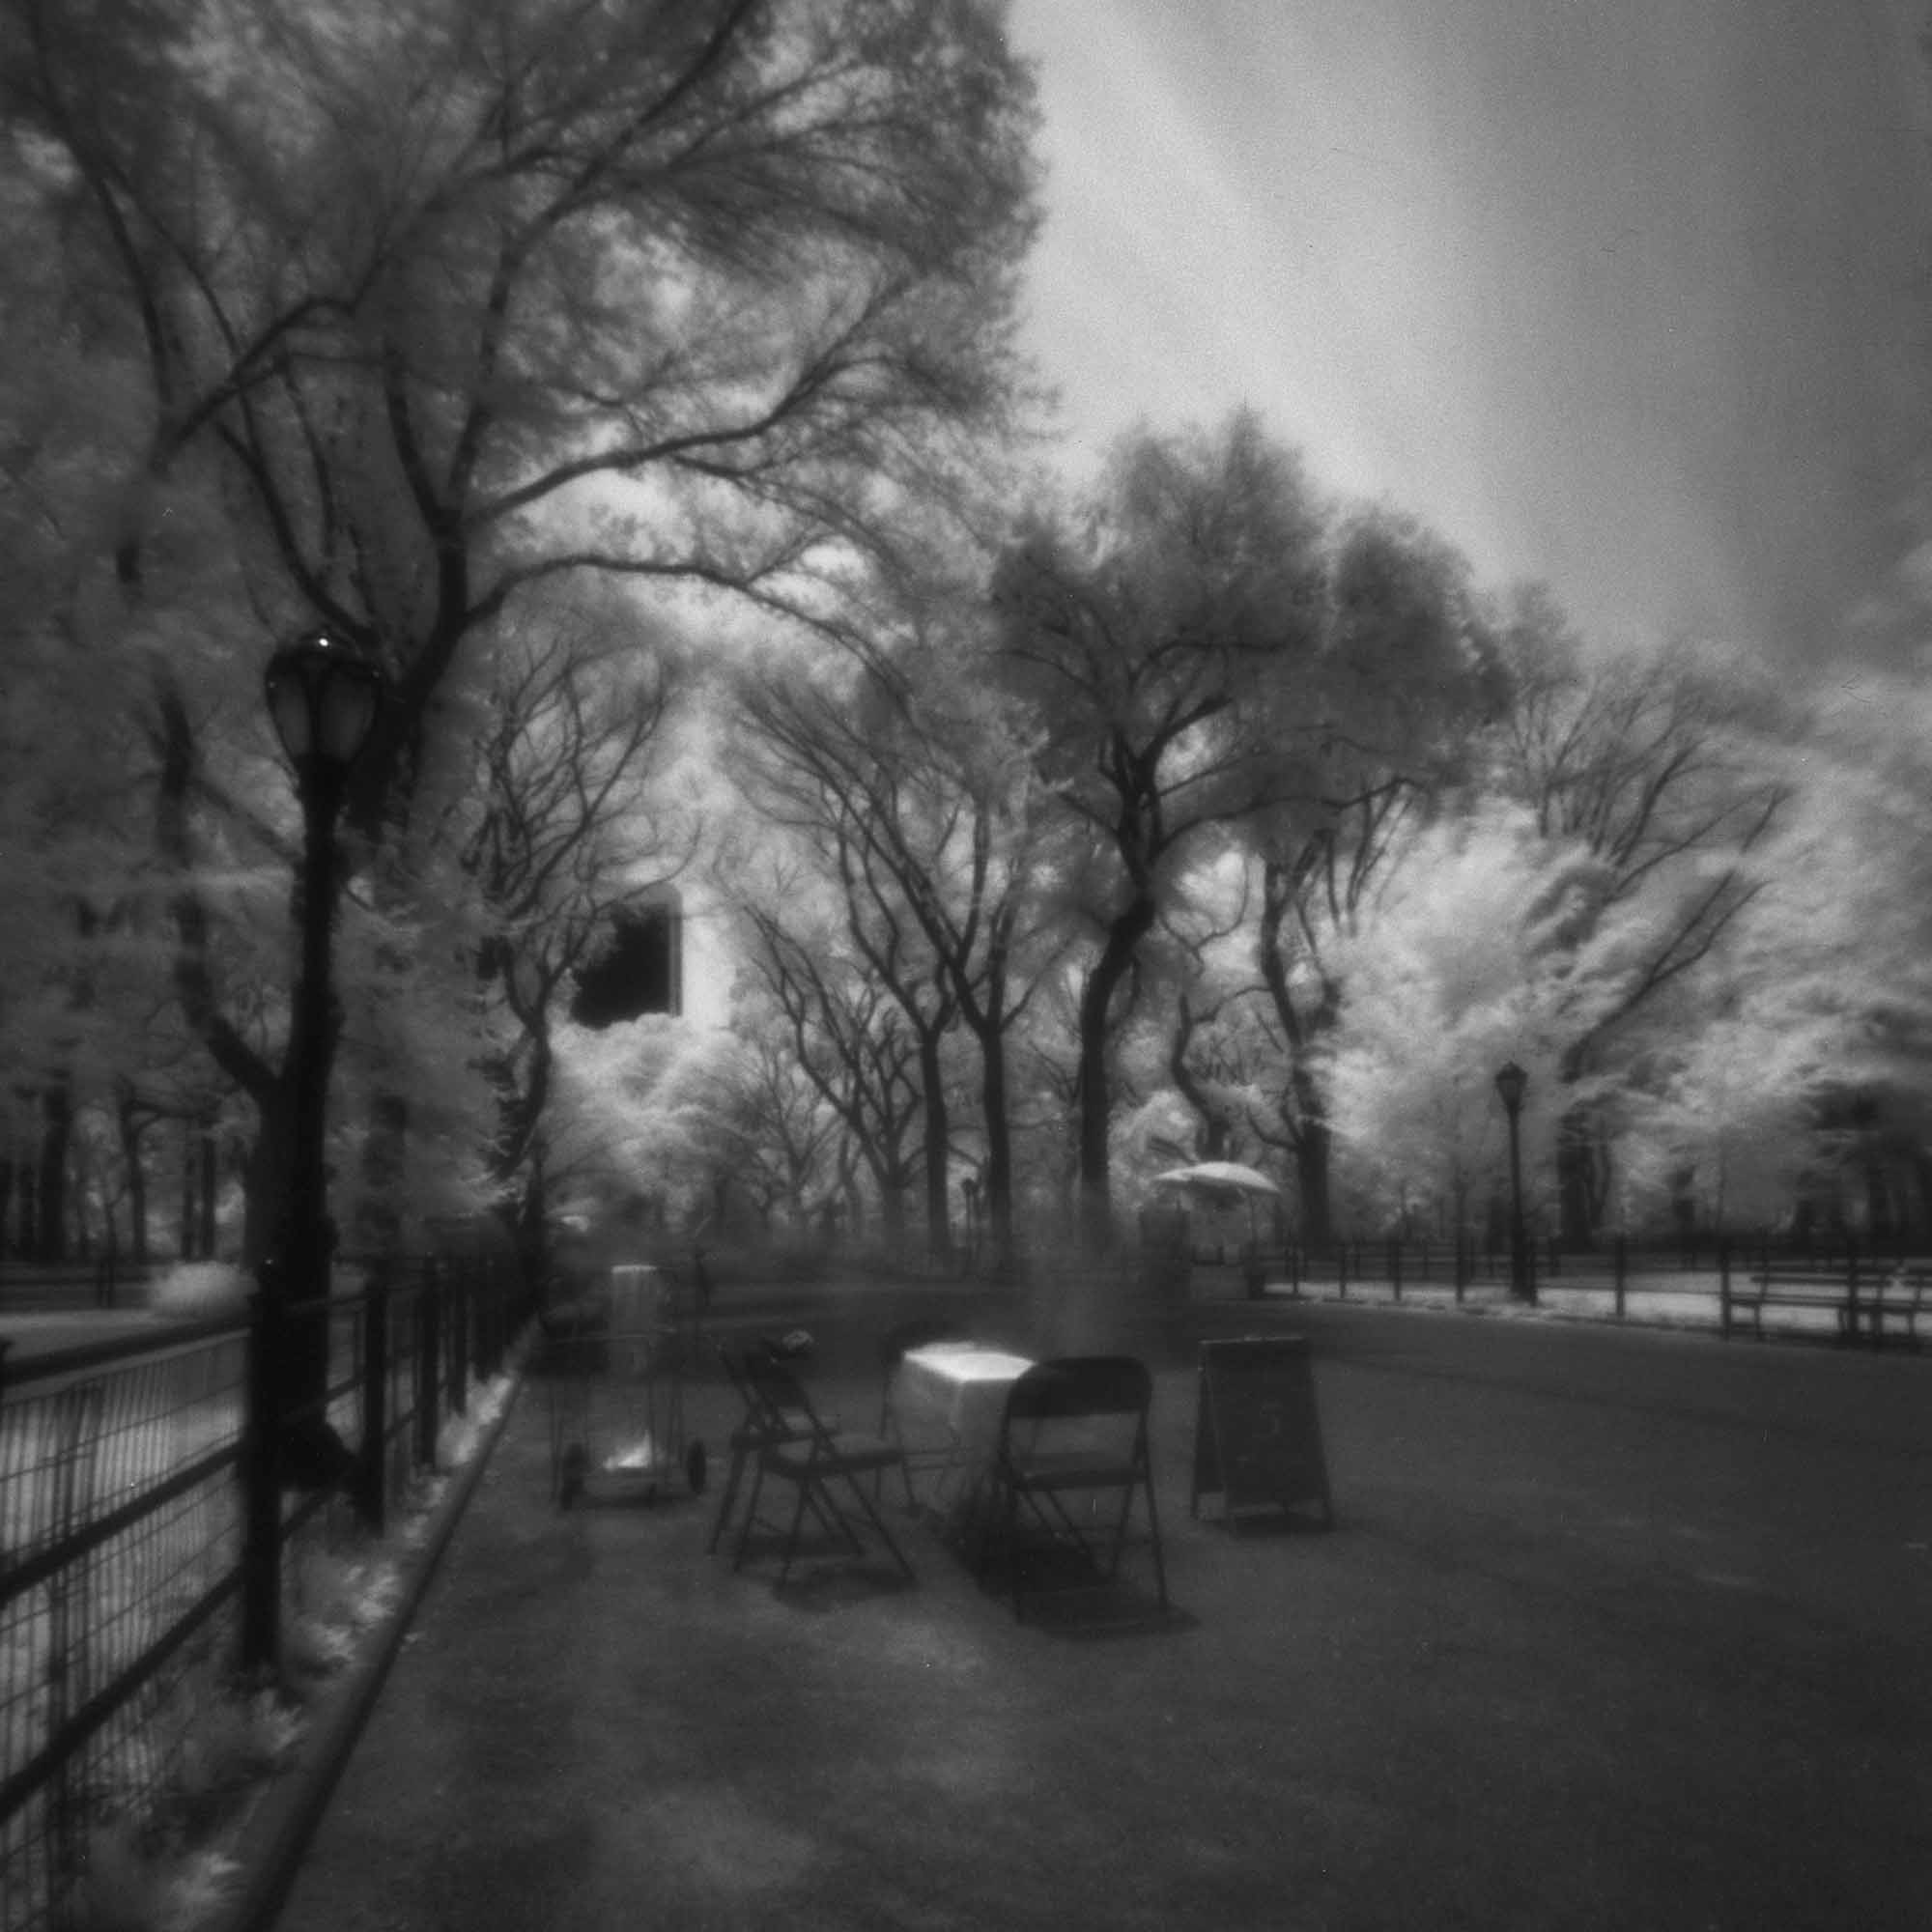 Central Park #1